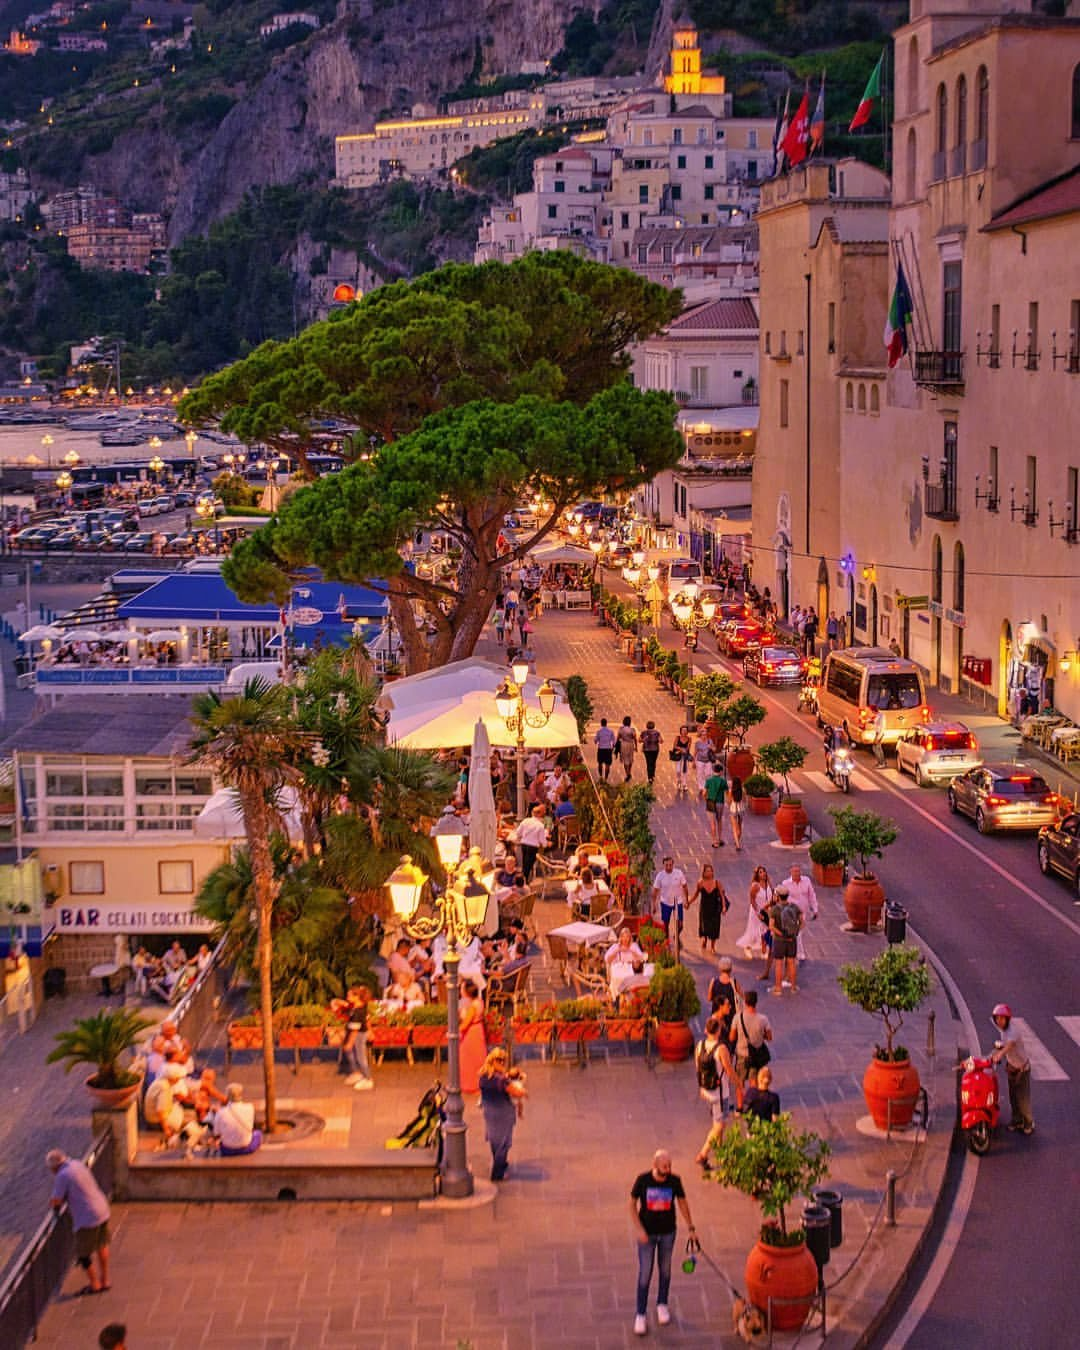 意大利夜幕低垂时✨ins:gennaro_rispoli